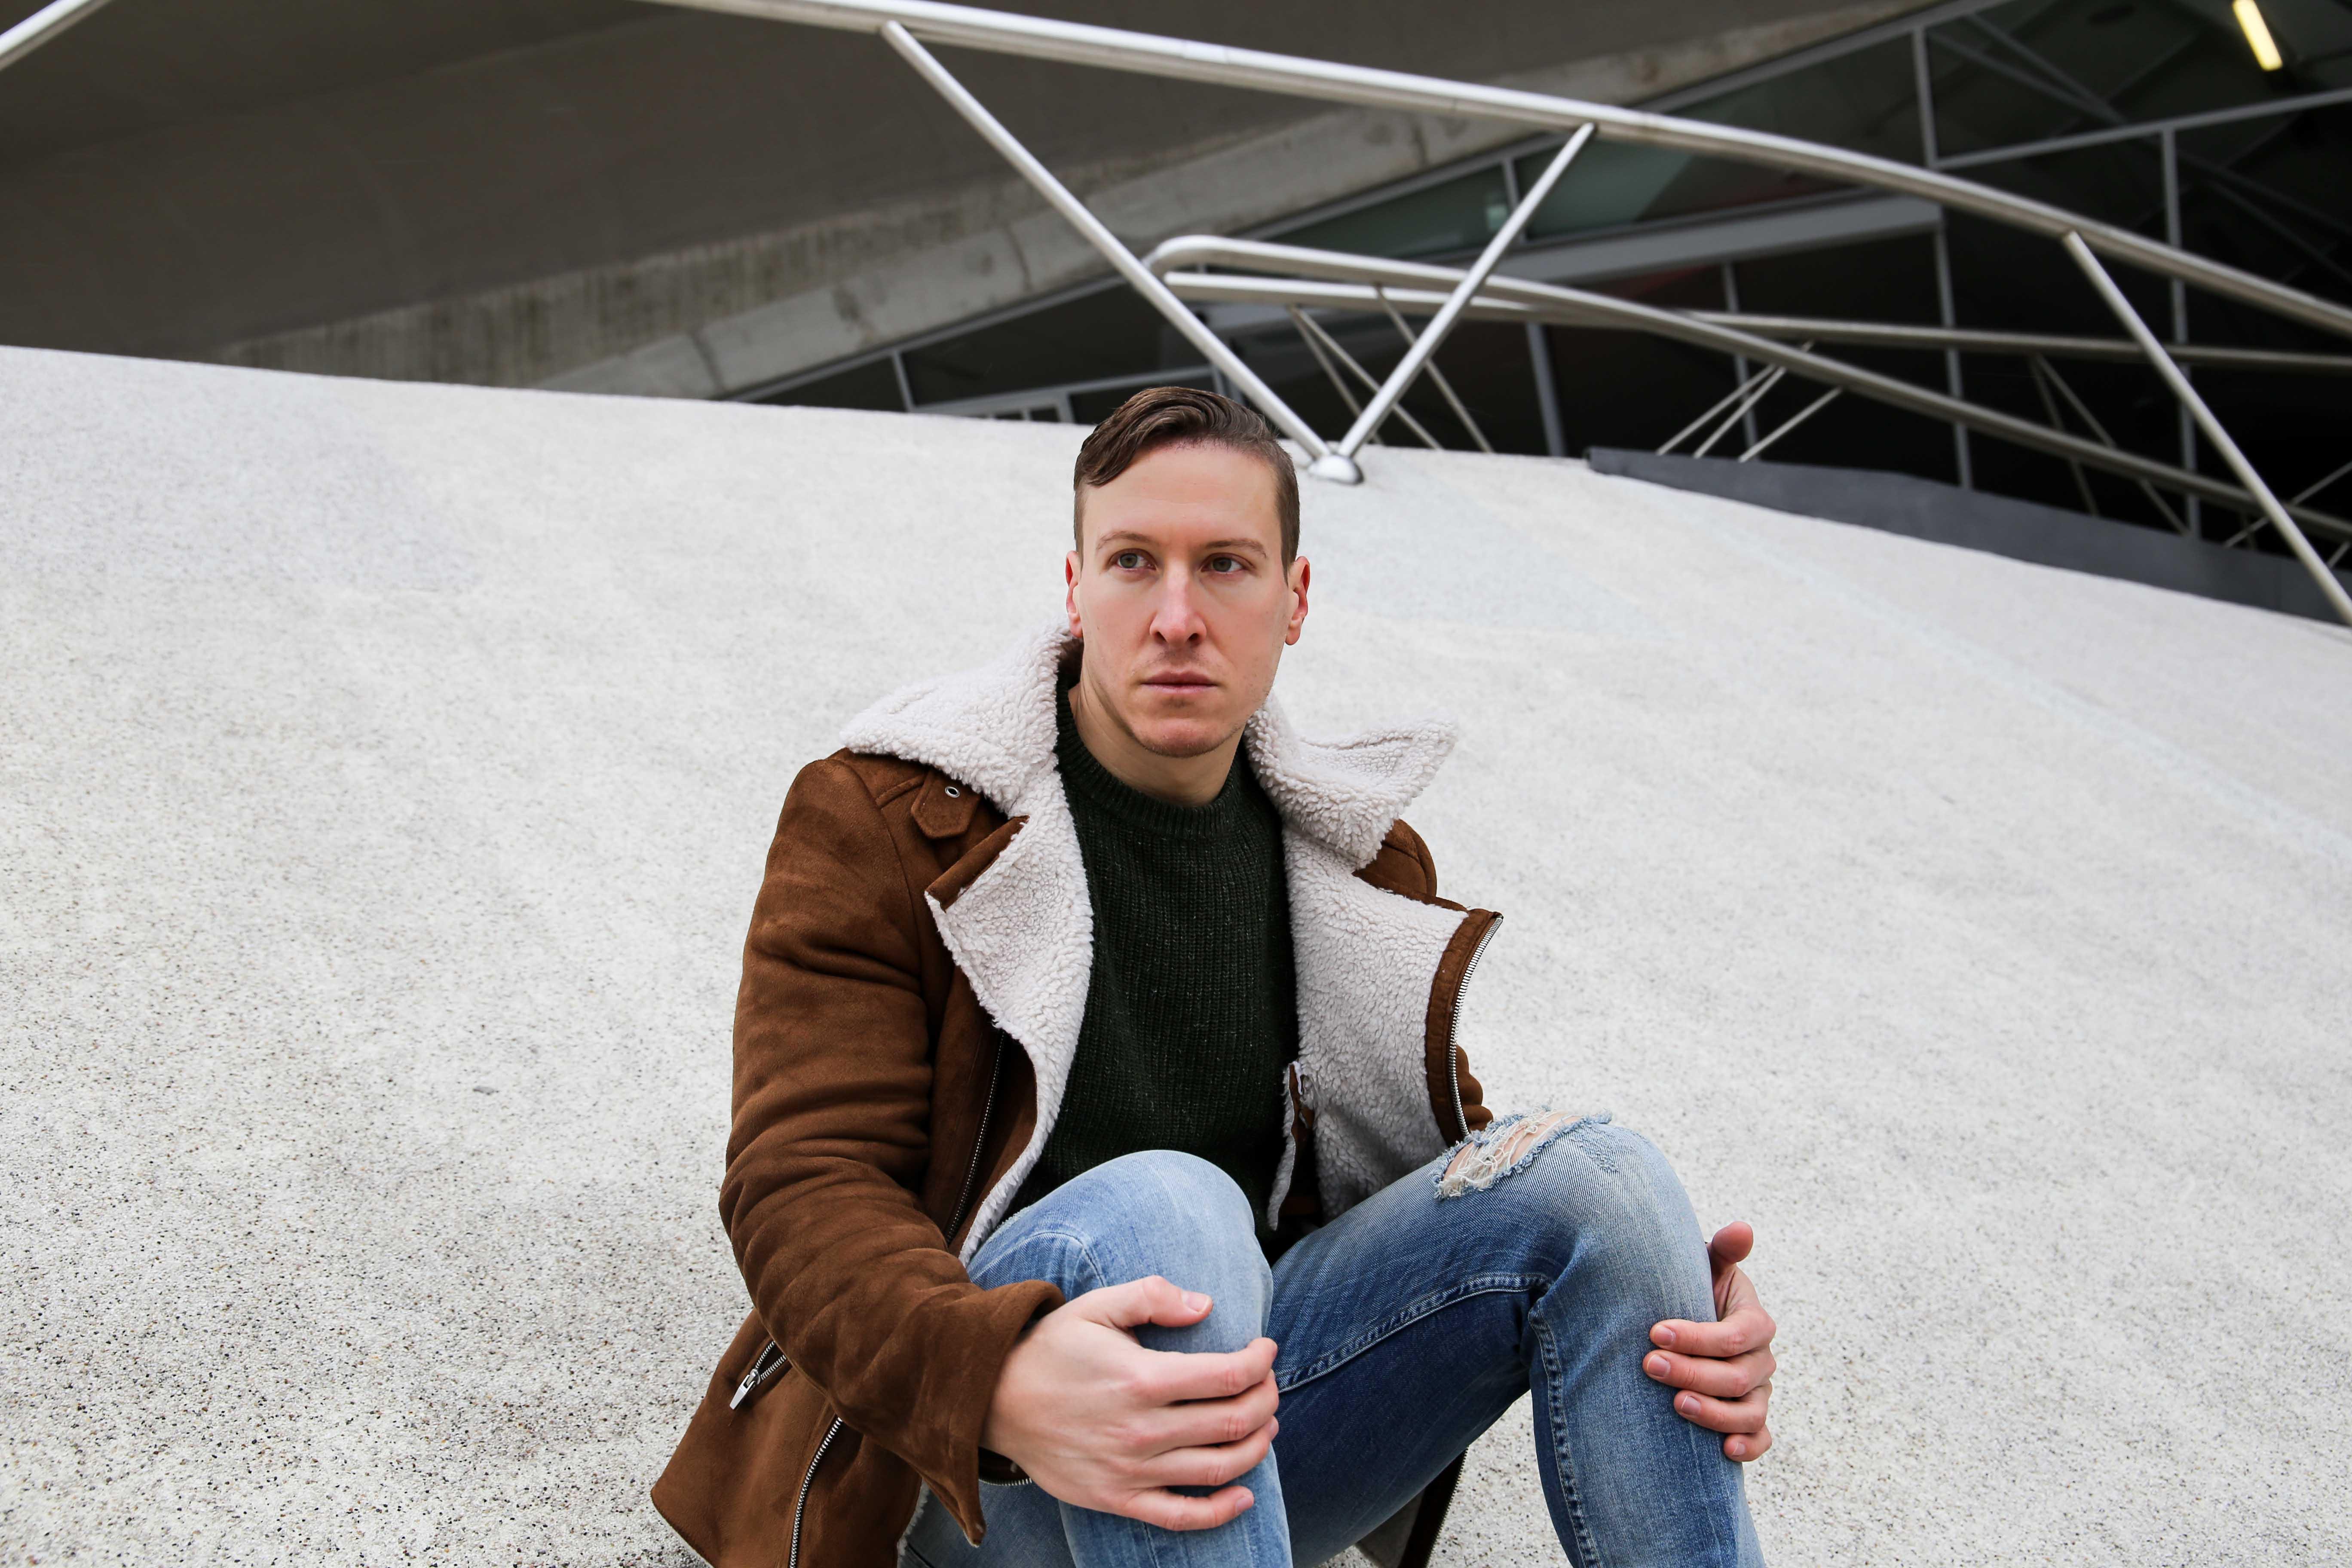 braune-sherpa-jacke-tannengrüner-pullover-braune-sorel-boots-casual-wear-outfit-männerblog-berlin-wolfsburg